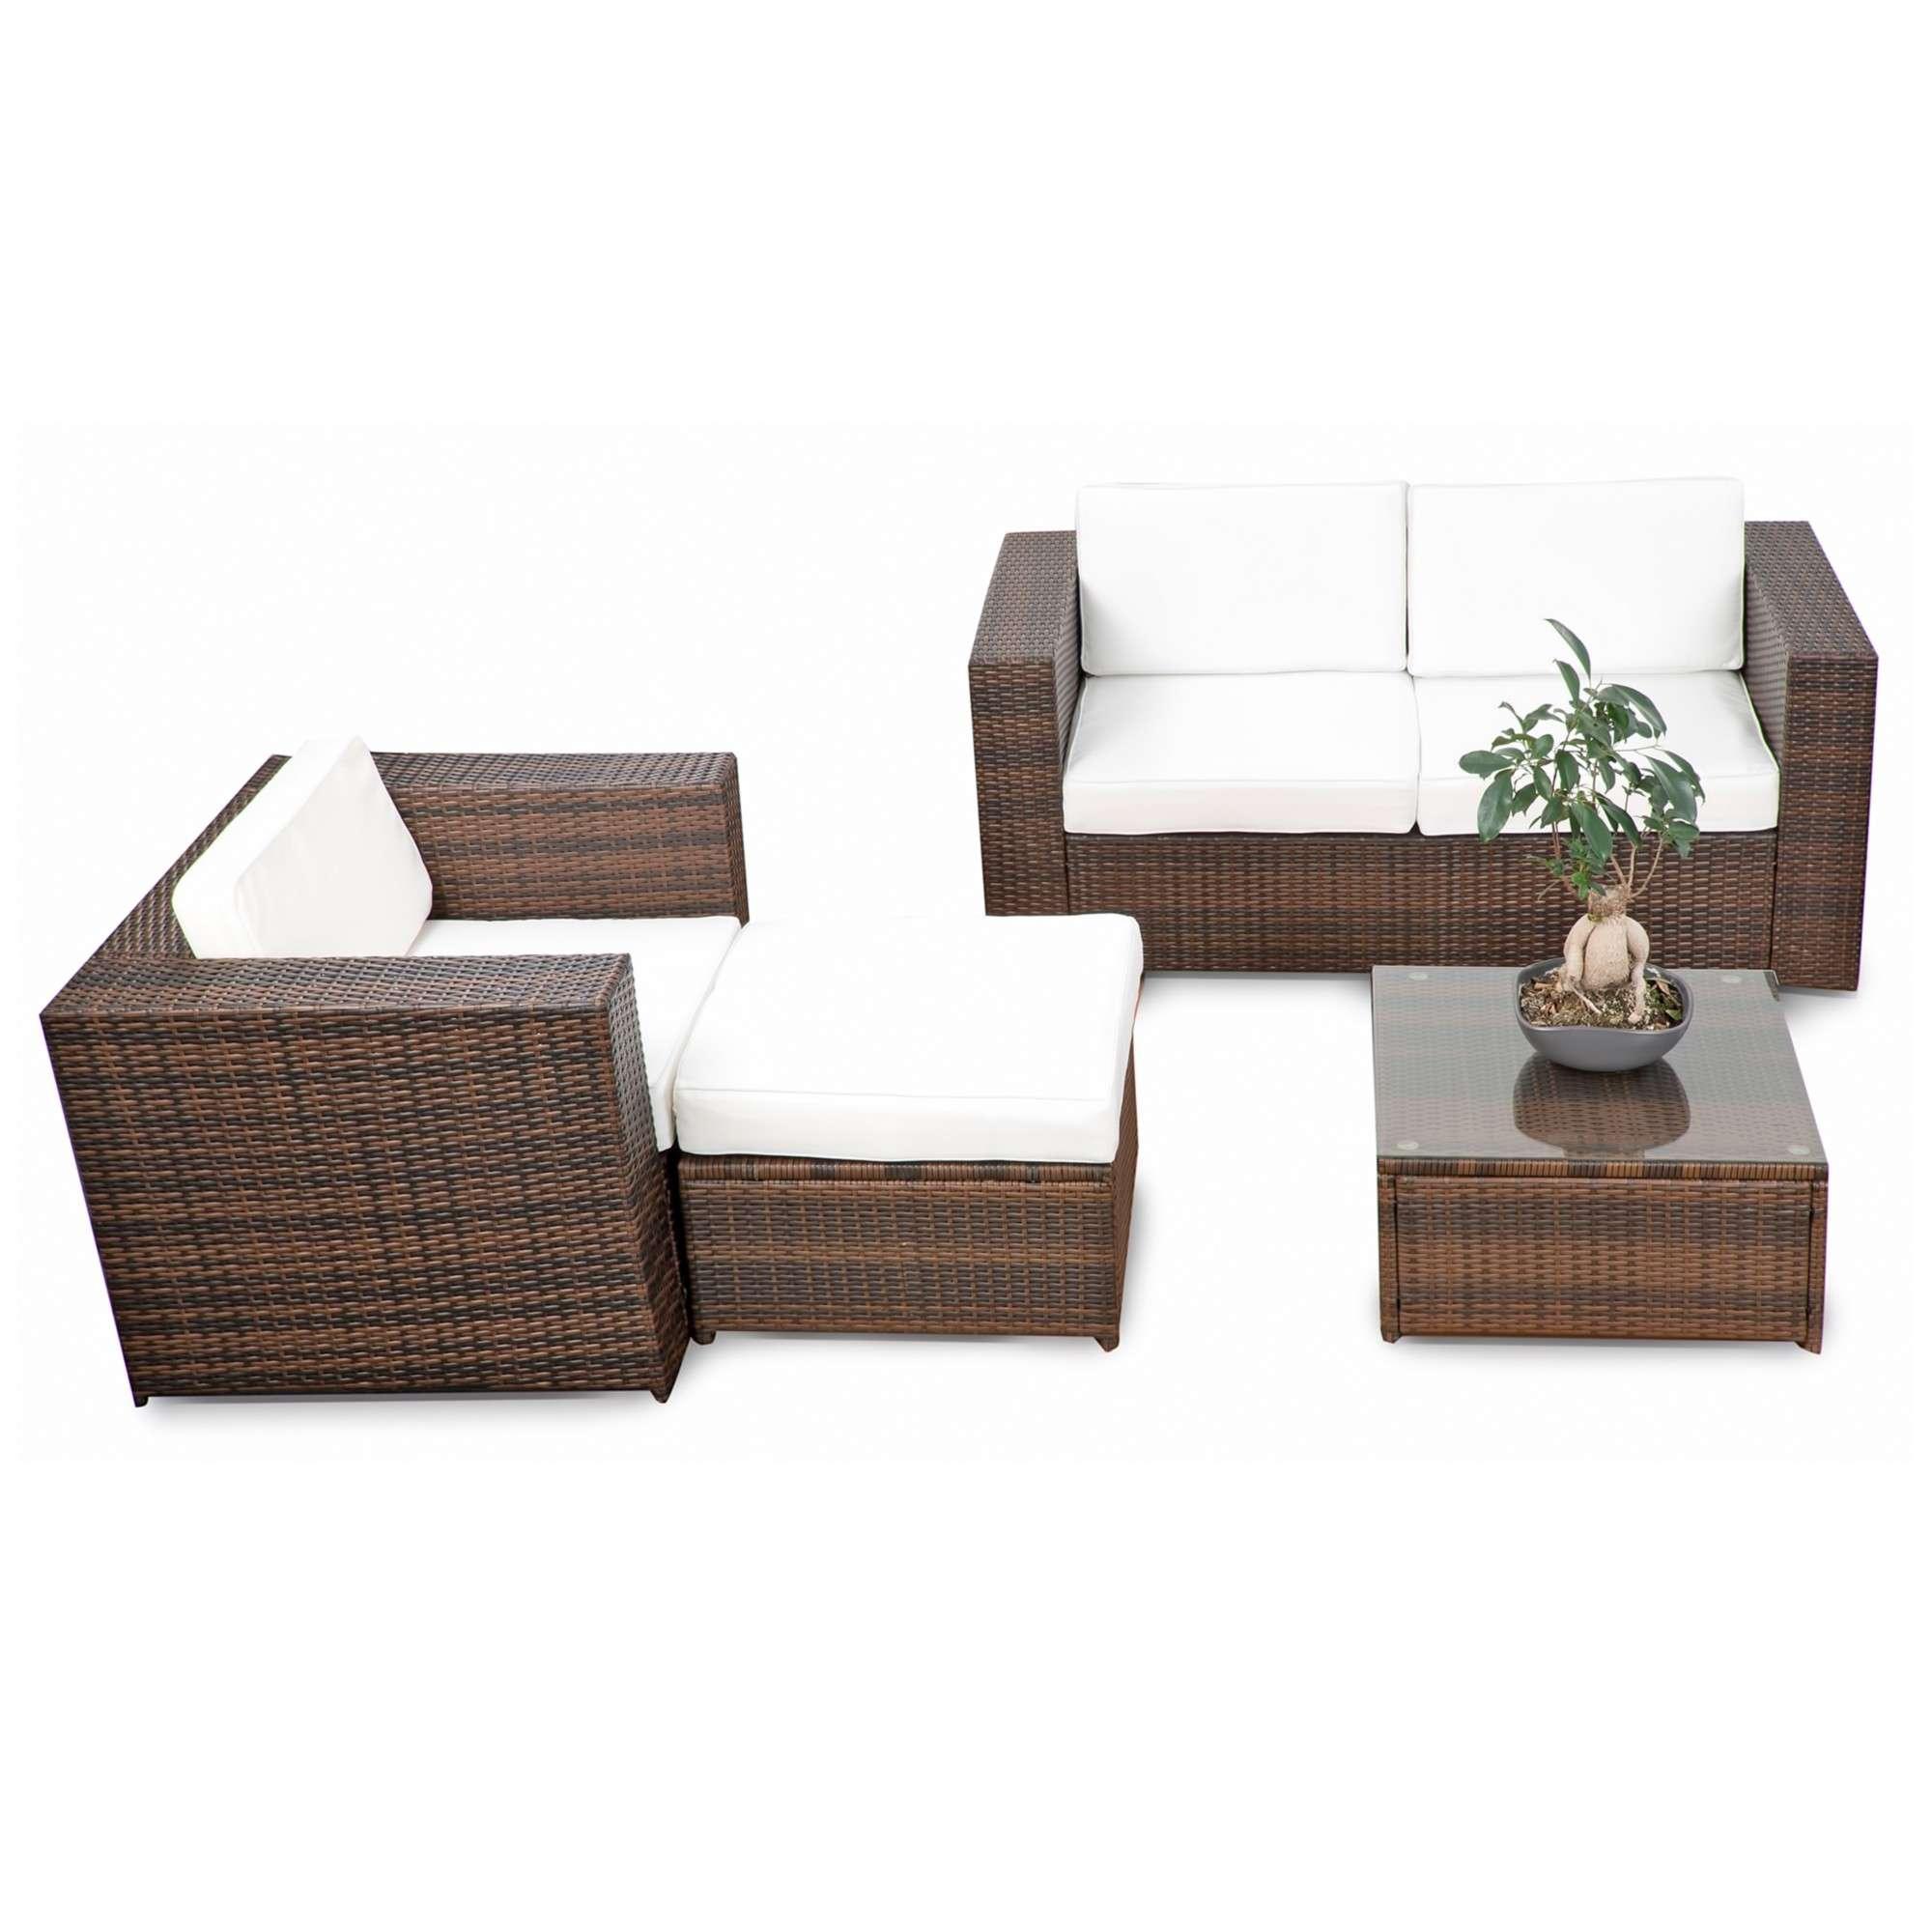 Balkonmöbel lounge  Balkonmöbel Lounge ▻ günstig ◅ Lounge Balkonmöbel kaufen